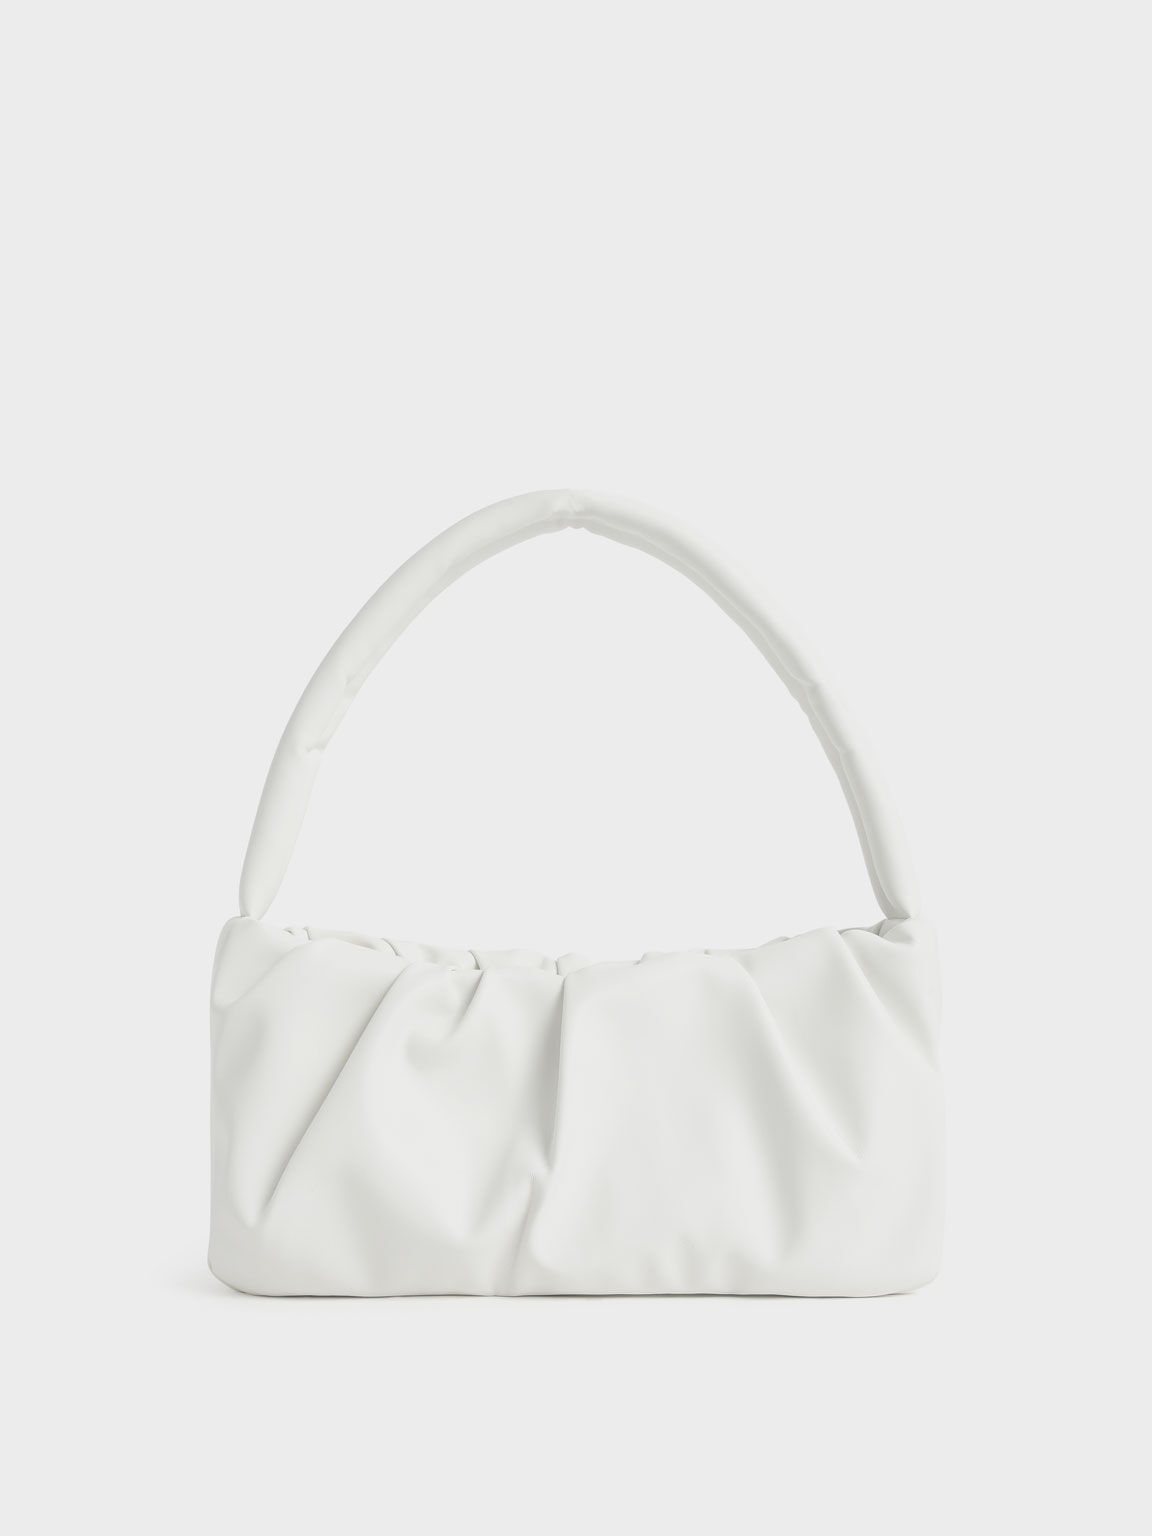 Ruched Top Handle Bag, White, hi-res